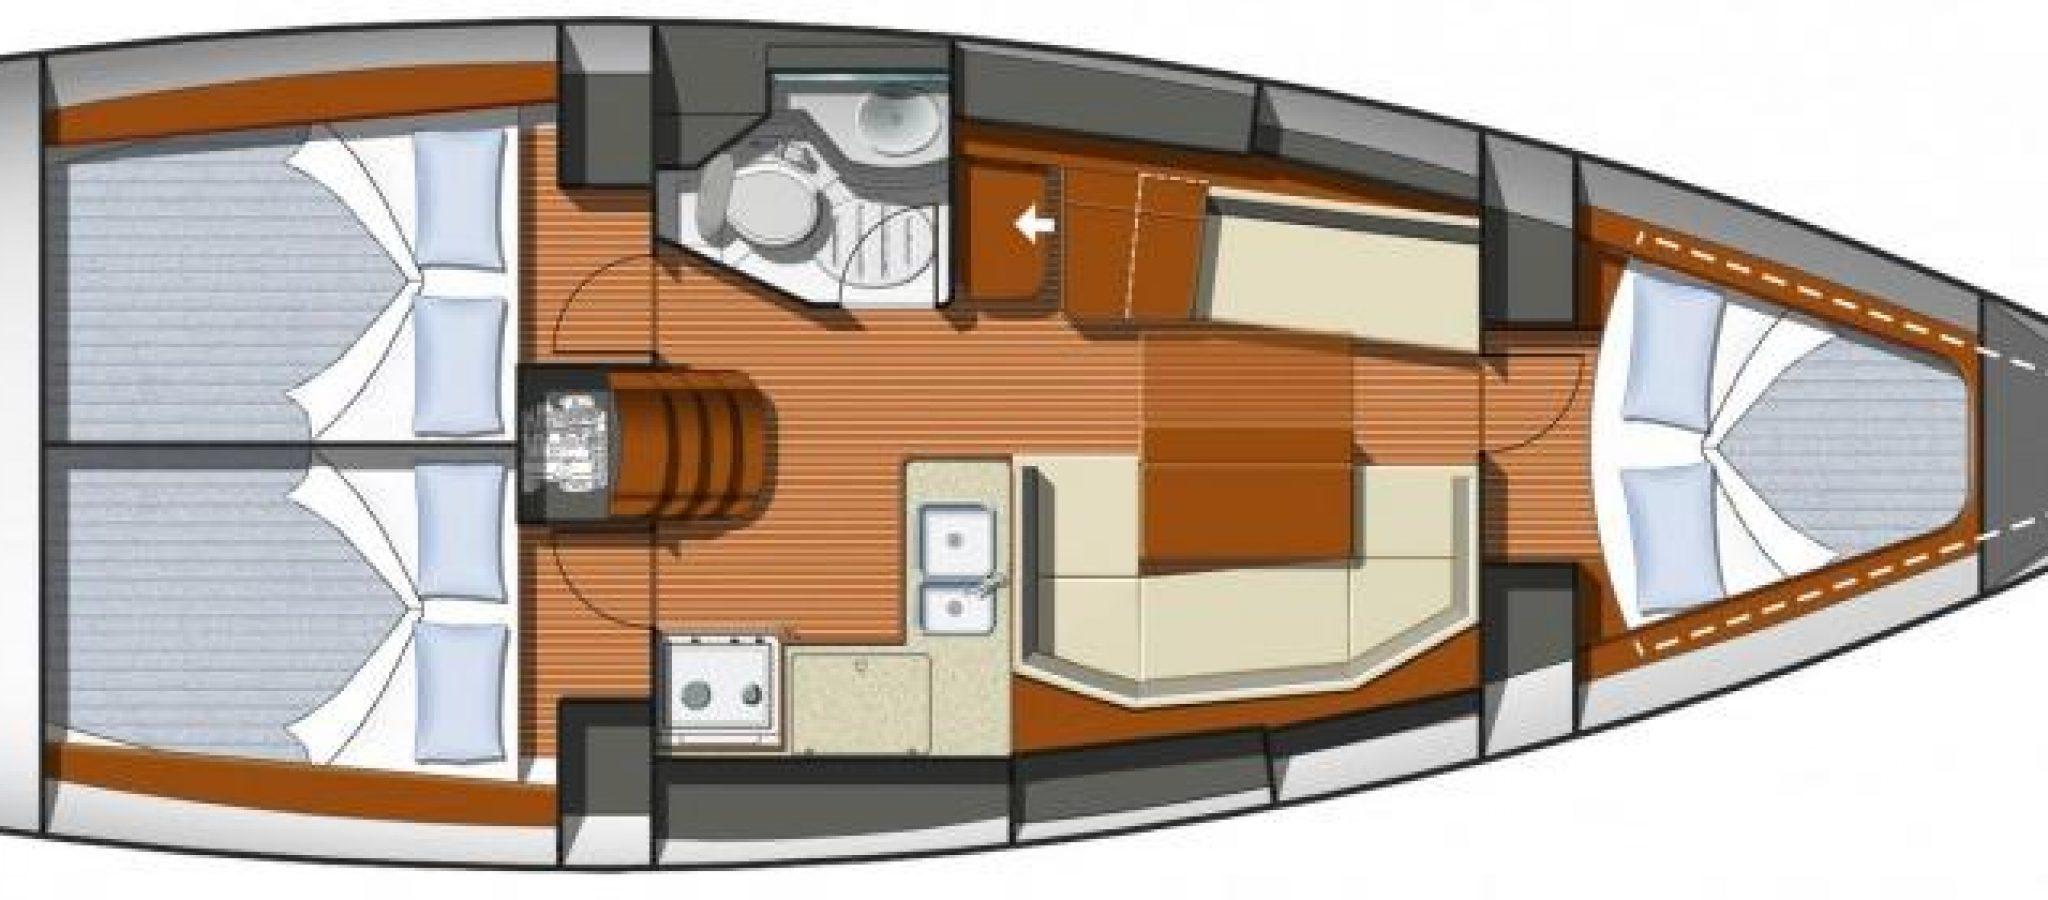 sun Odyssey 36i plan 3 cabines